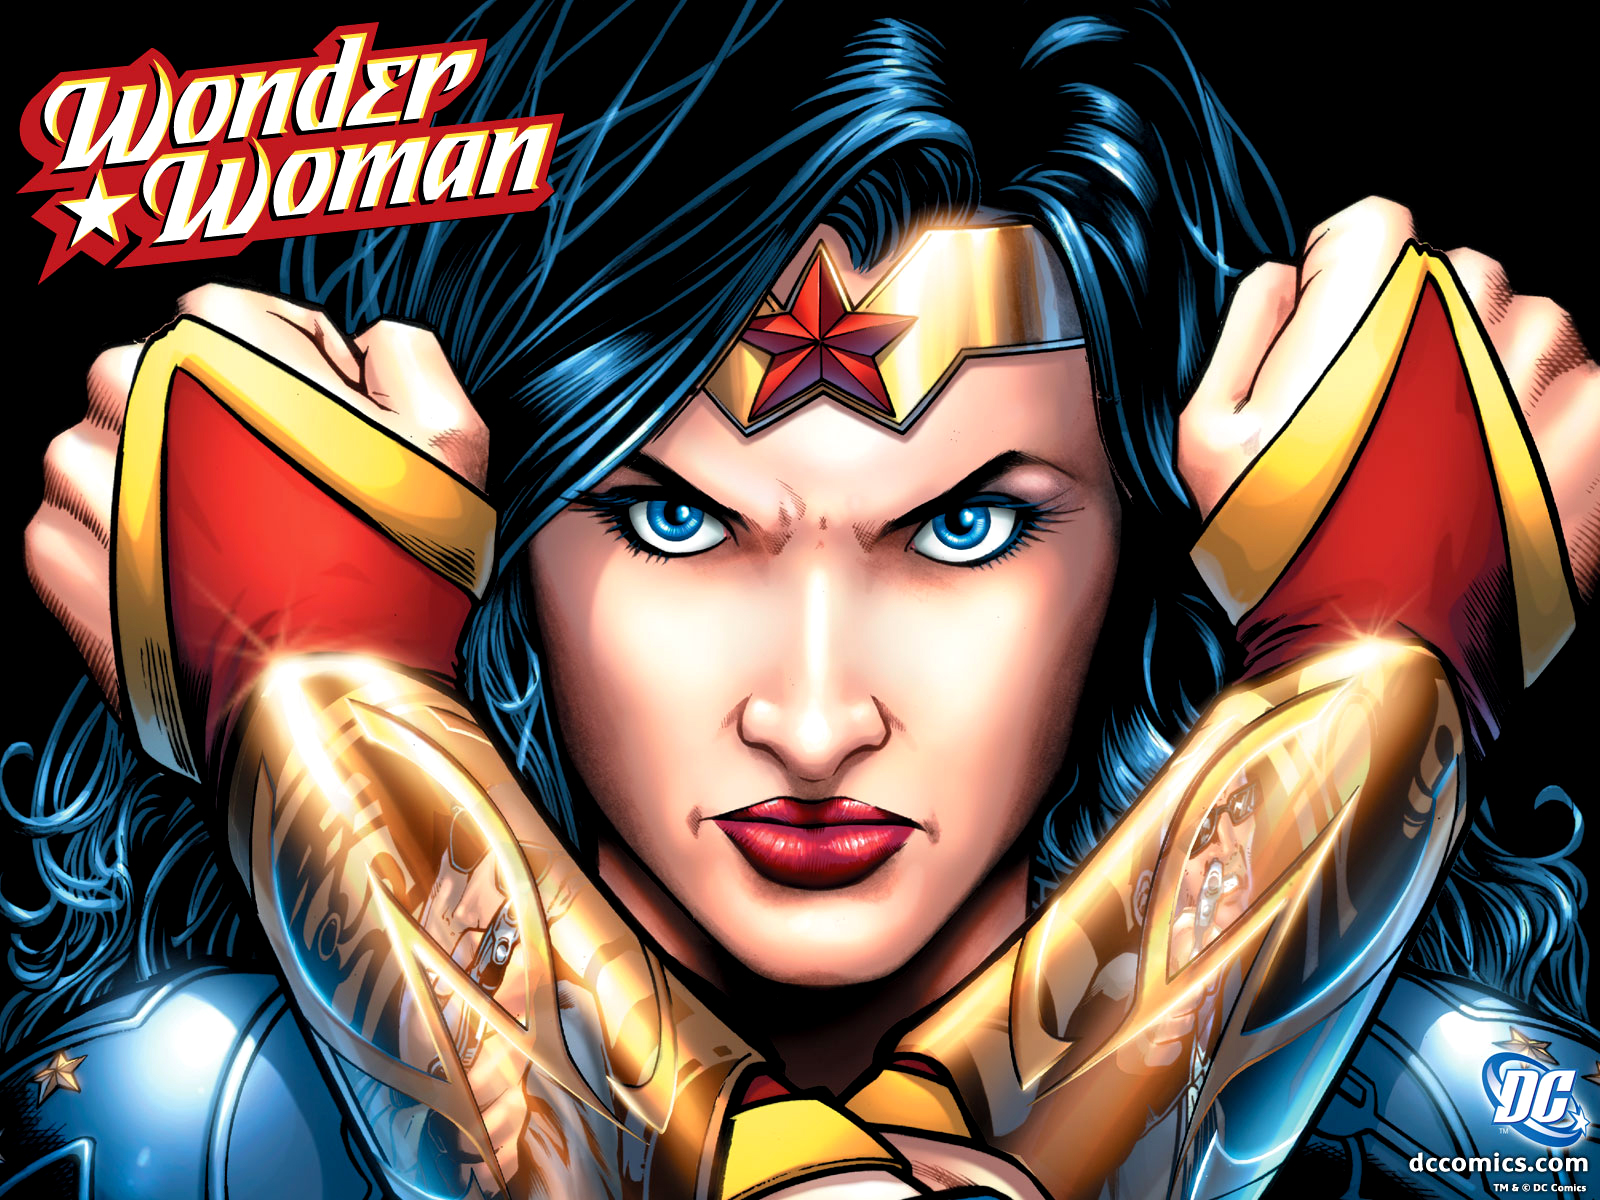 Wonder Woman WW DC Comics HD Wallpaper Download Wallpapers in HD 1600x1200